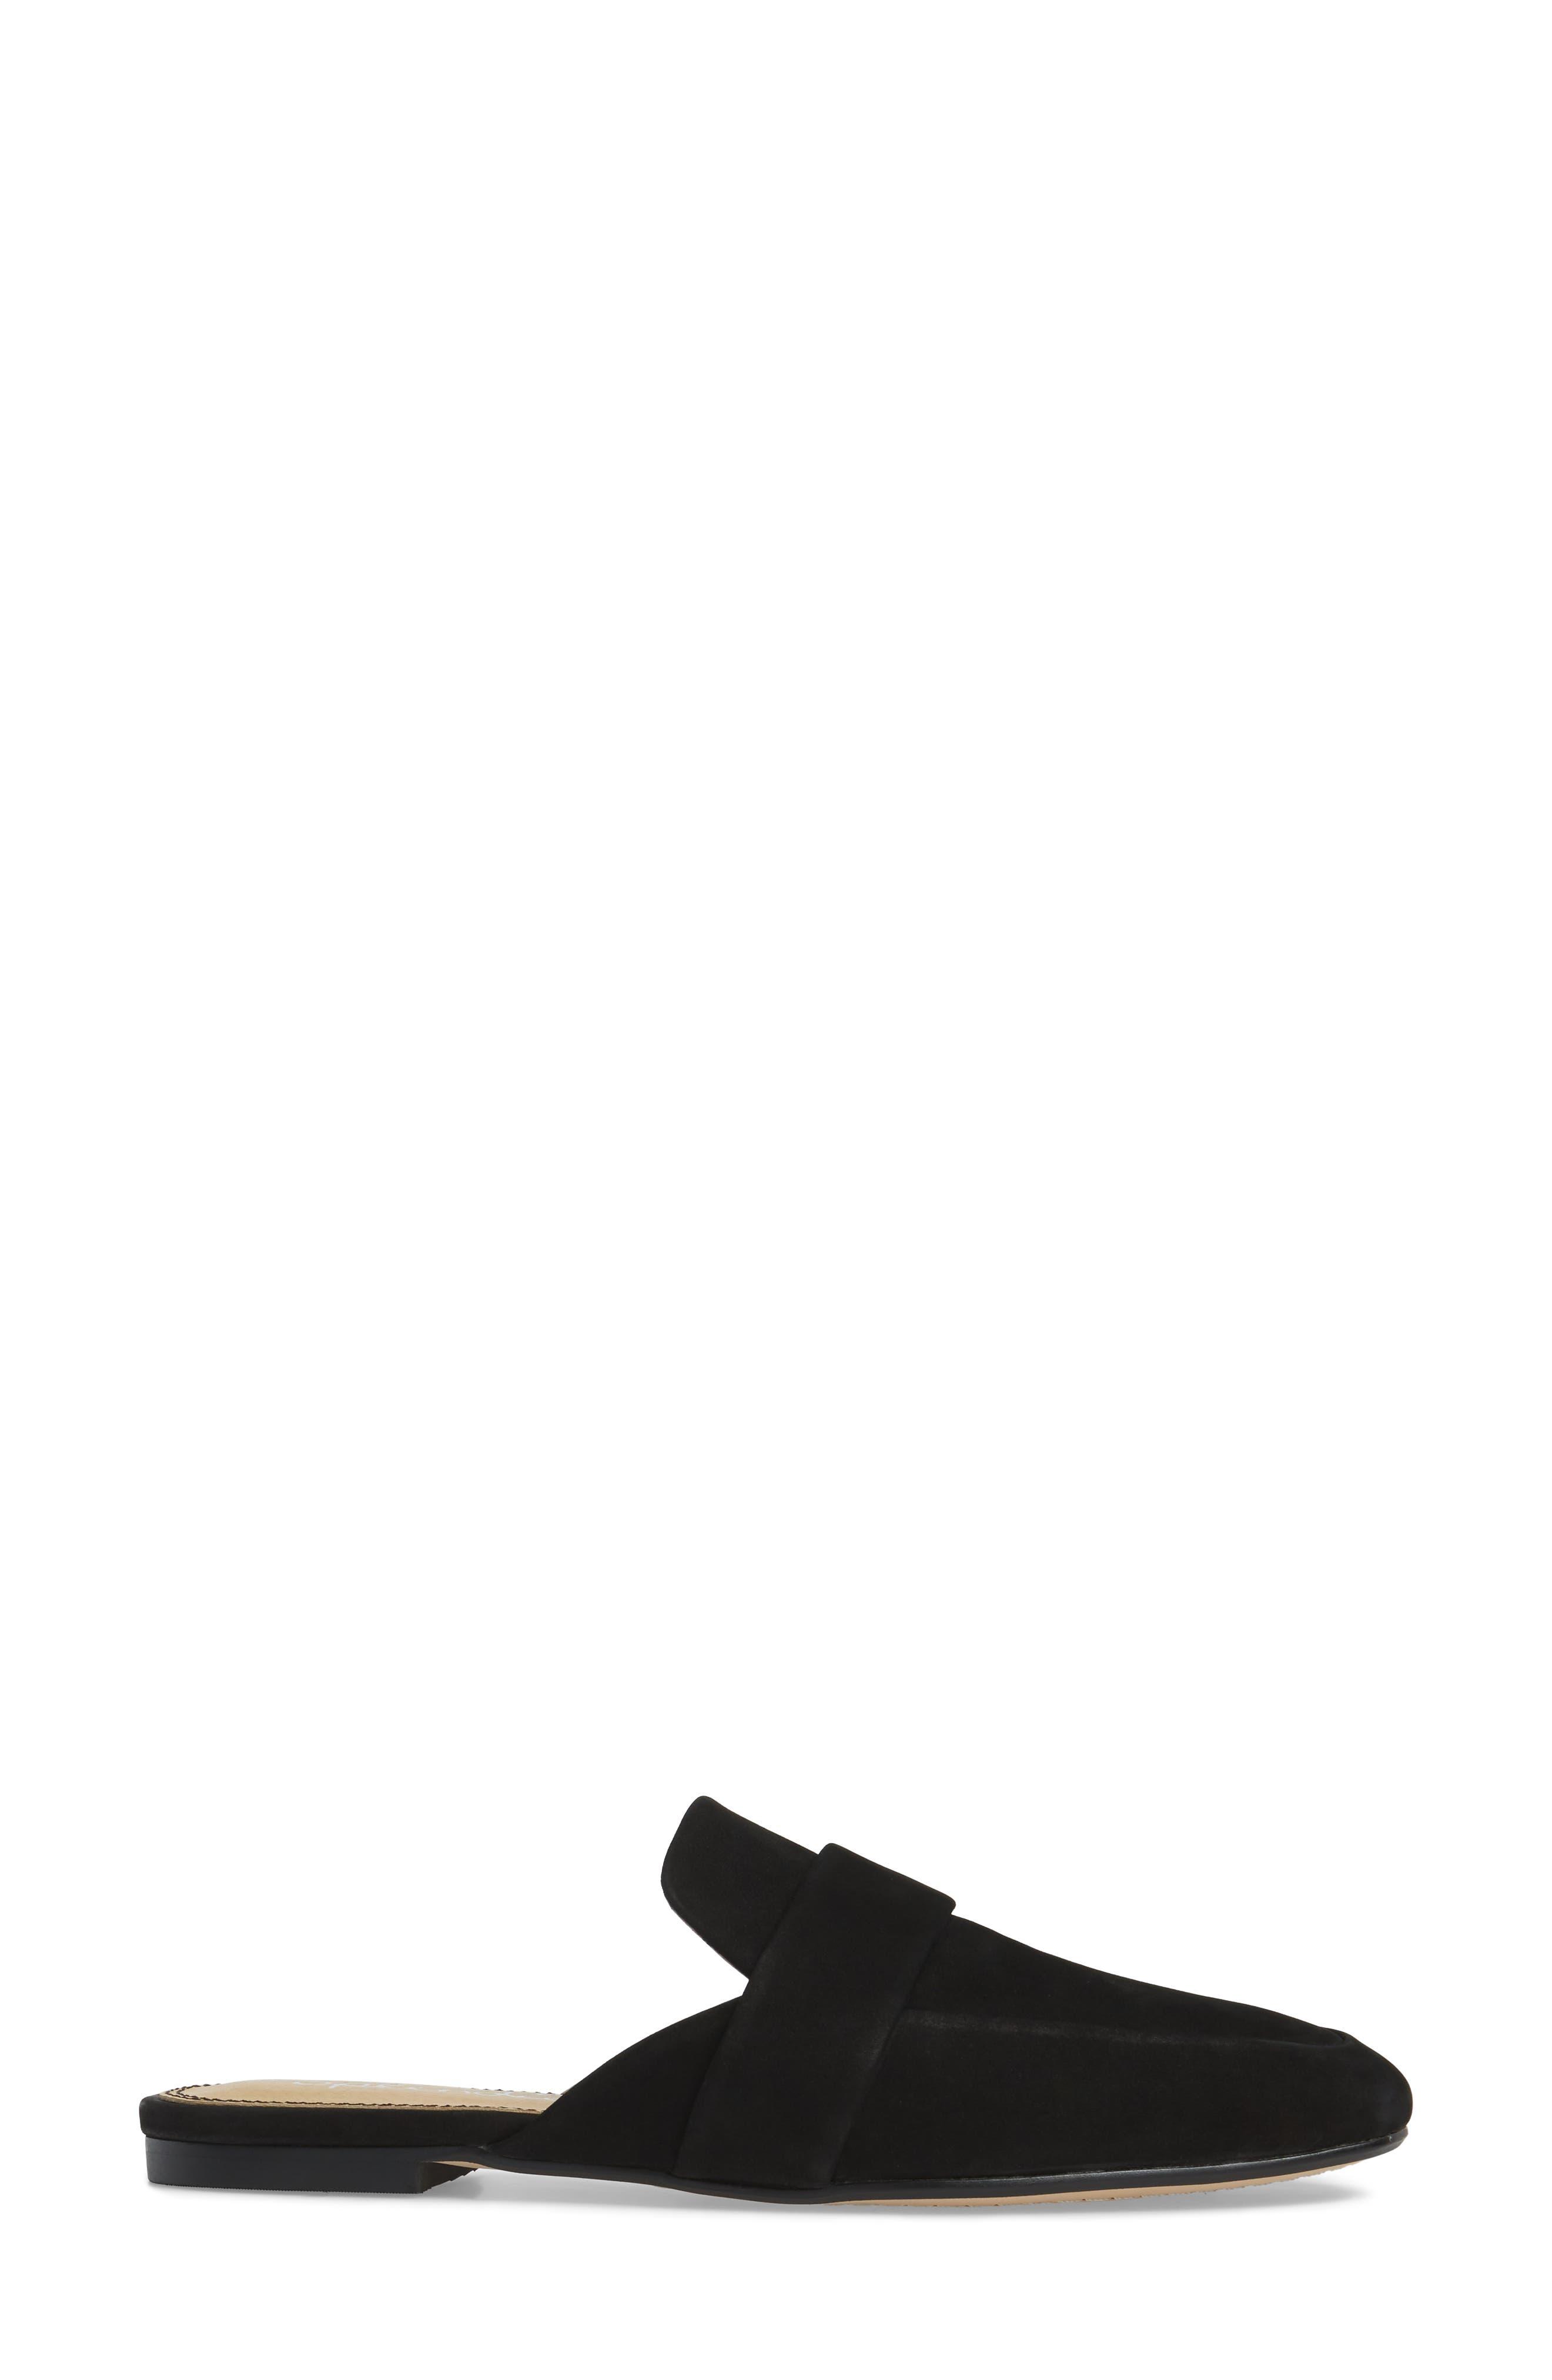 Delroy Slide Mule,                             Alternate thumbnail 3, color,                             002